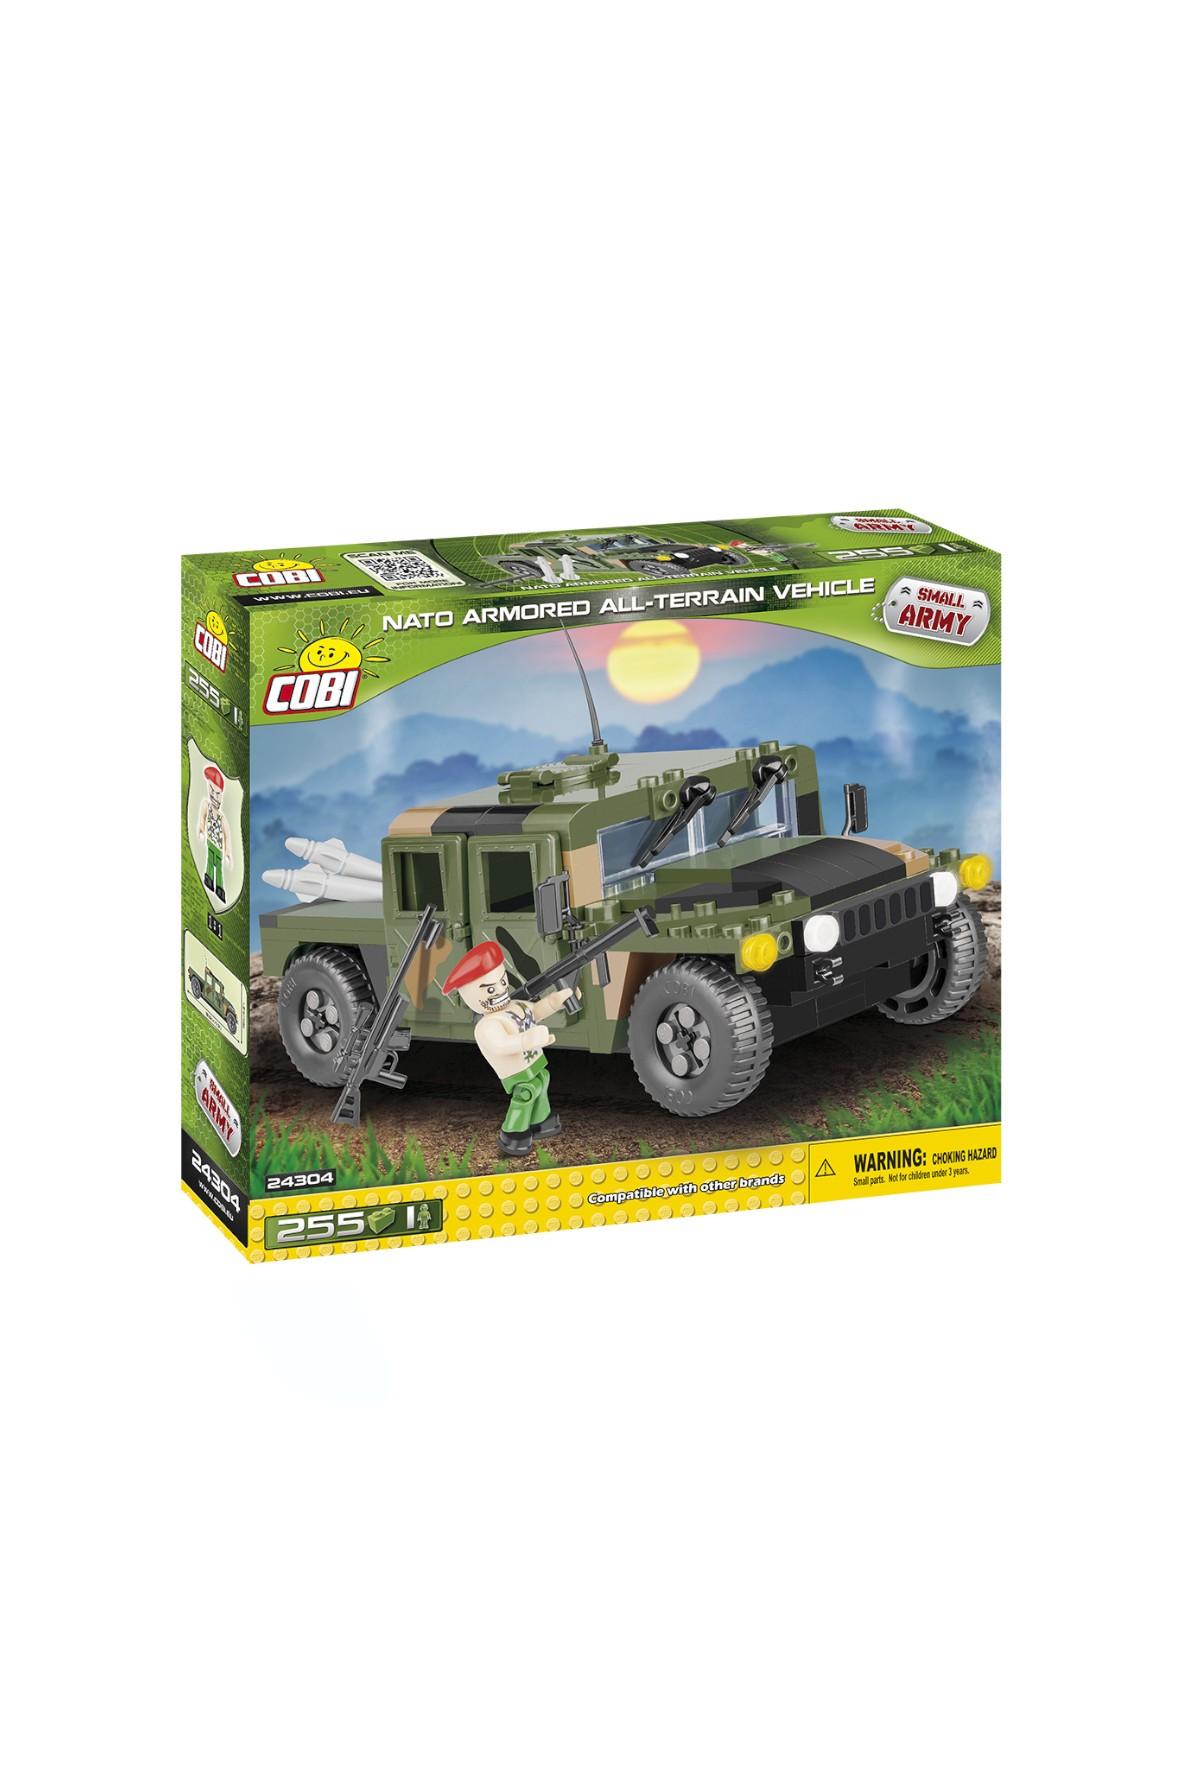 Klocki COBI Small army 24304